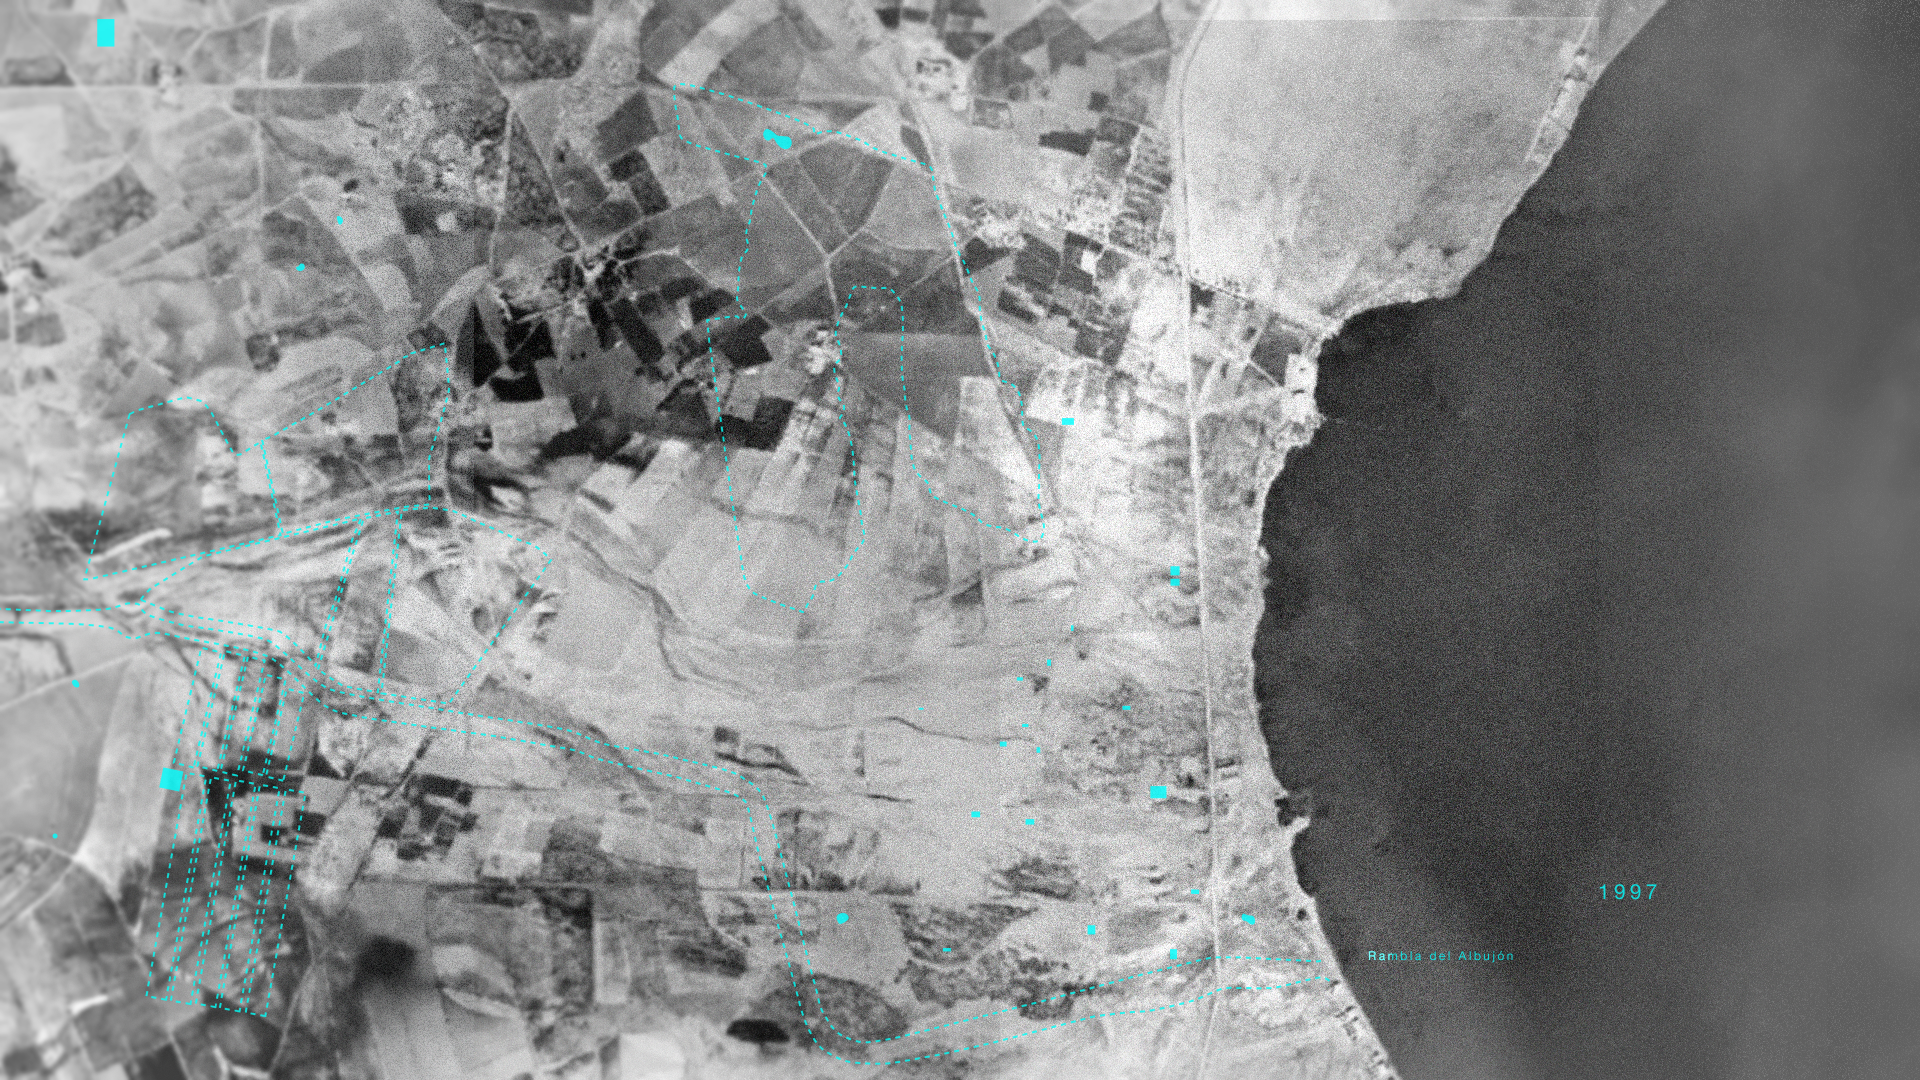 The landscape surrounding the Mar Menor Lagoon in 1997.